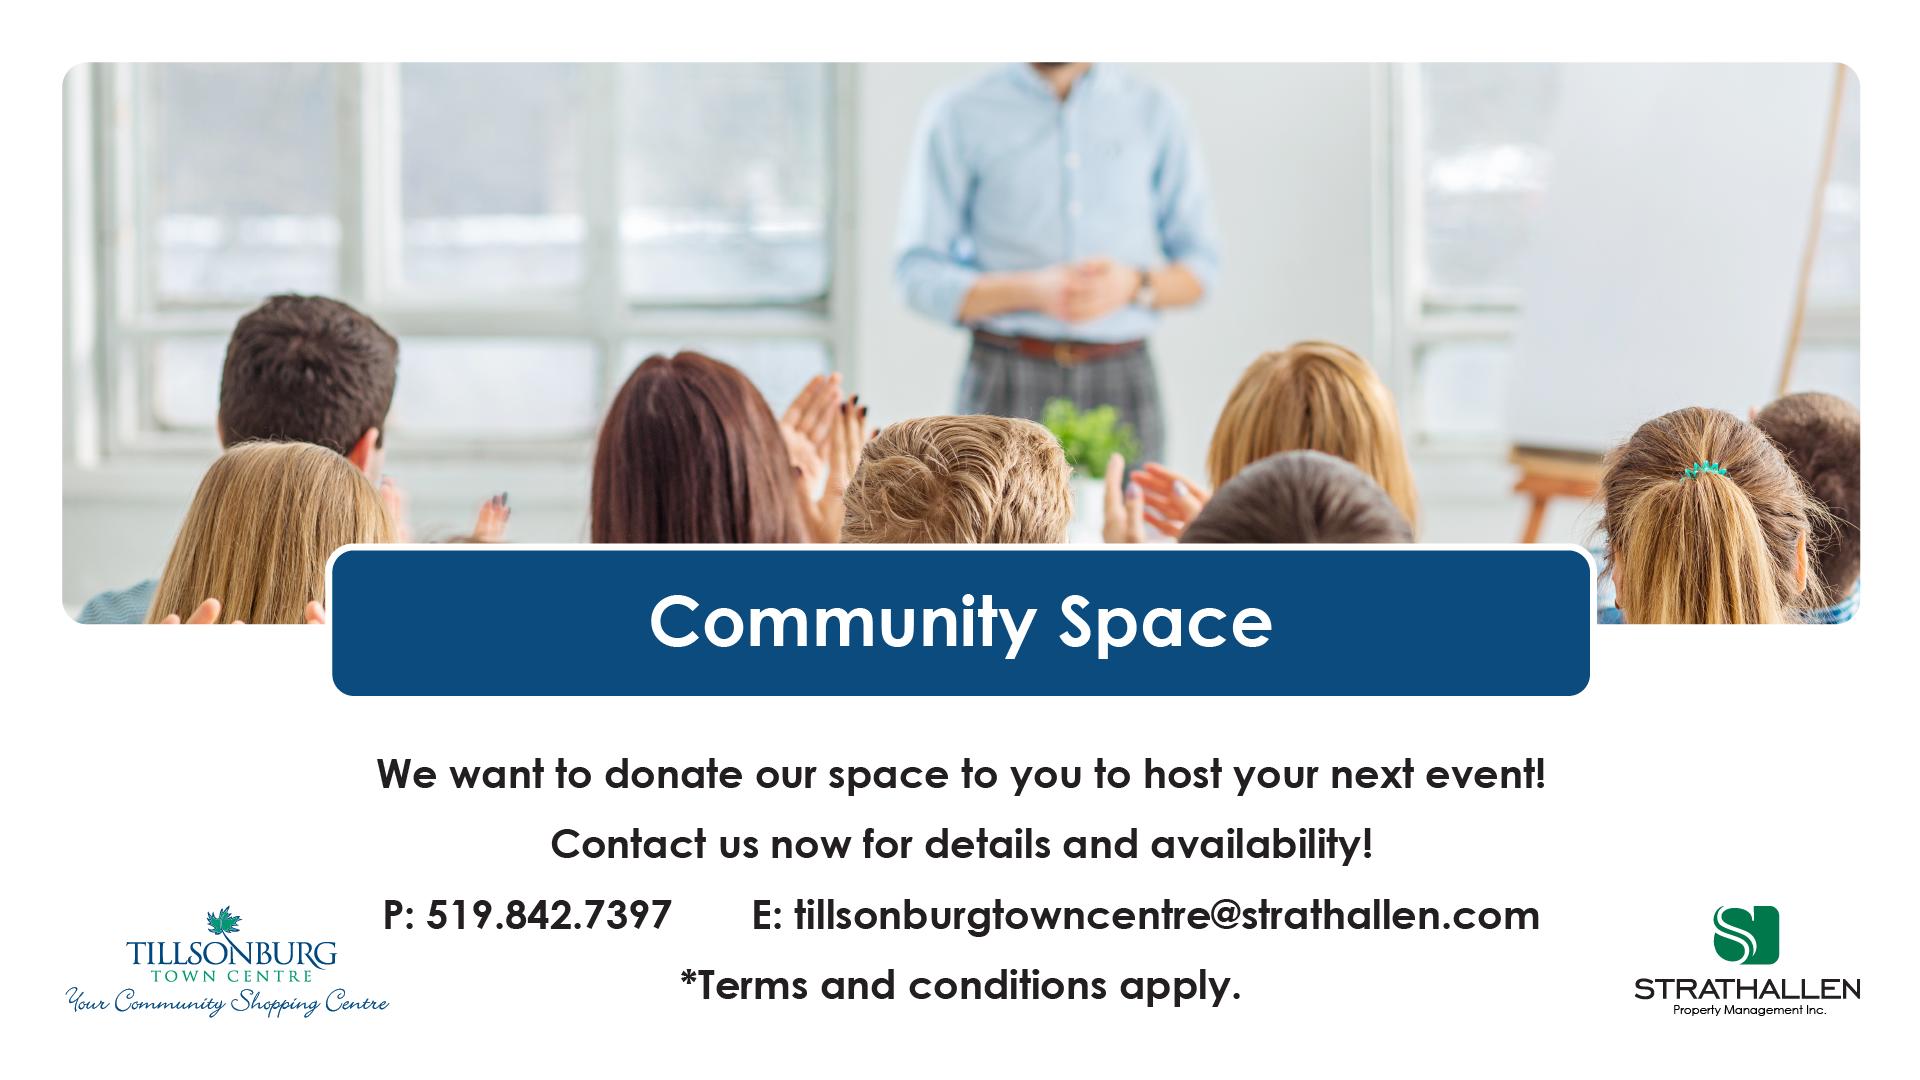 Community Space - Banners_Tillsonburg copy 2